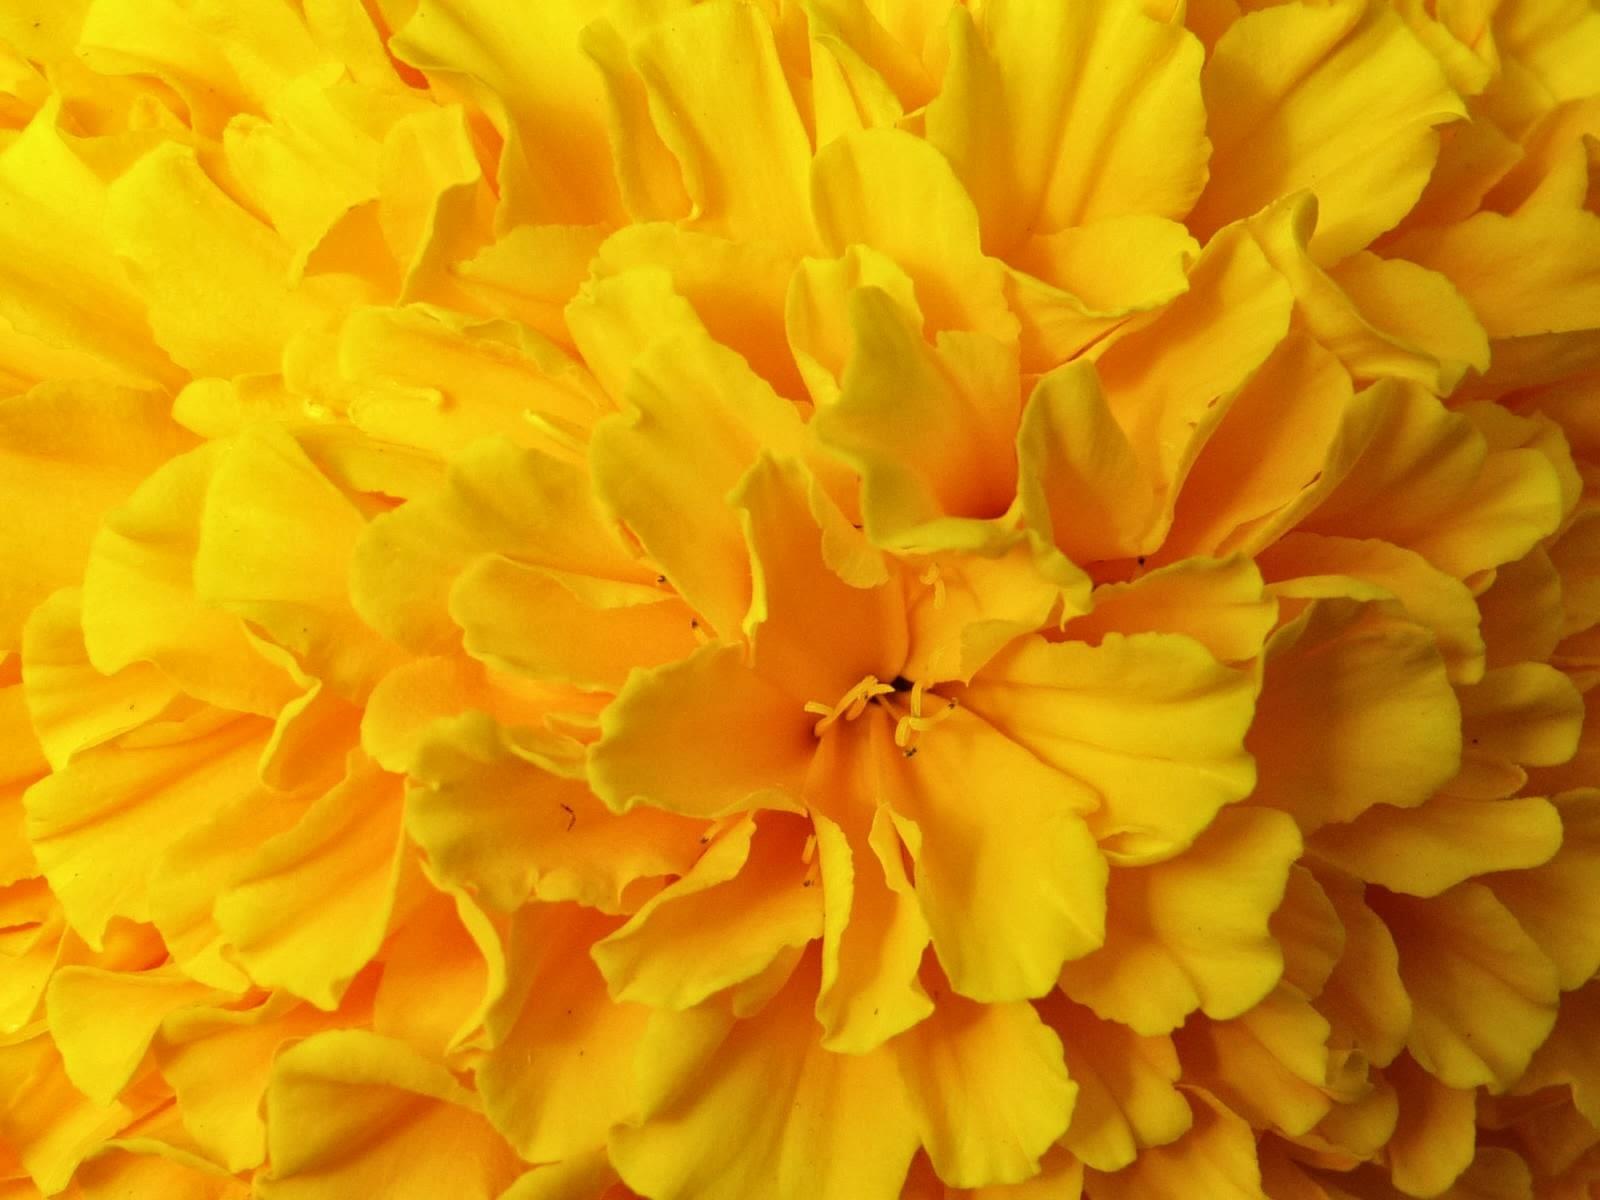 yellow flower wallpaper 9790 hd desktop wallpaperjpg 1600x1200